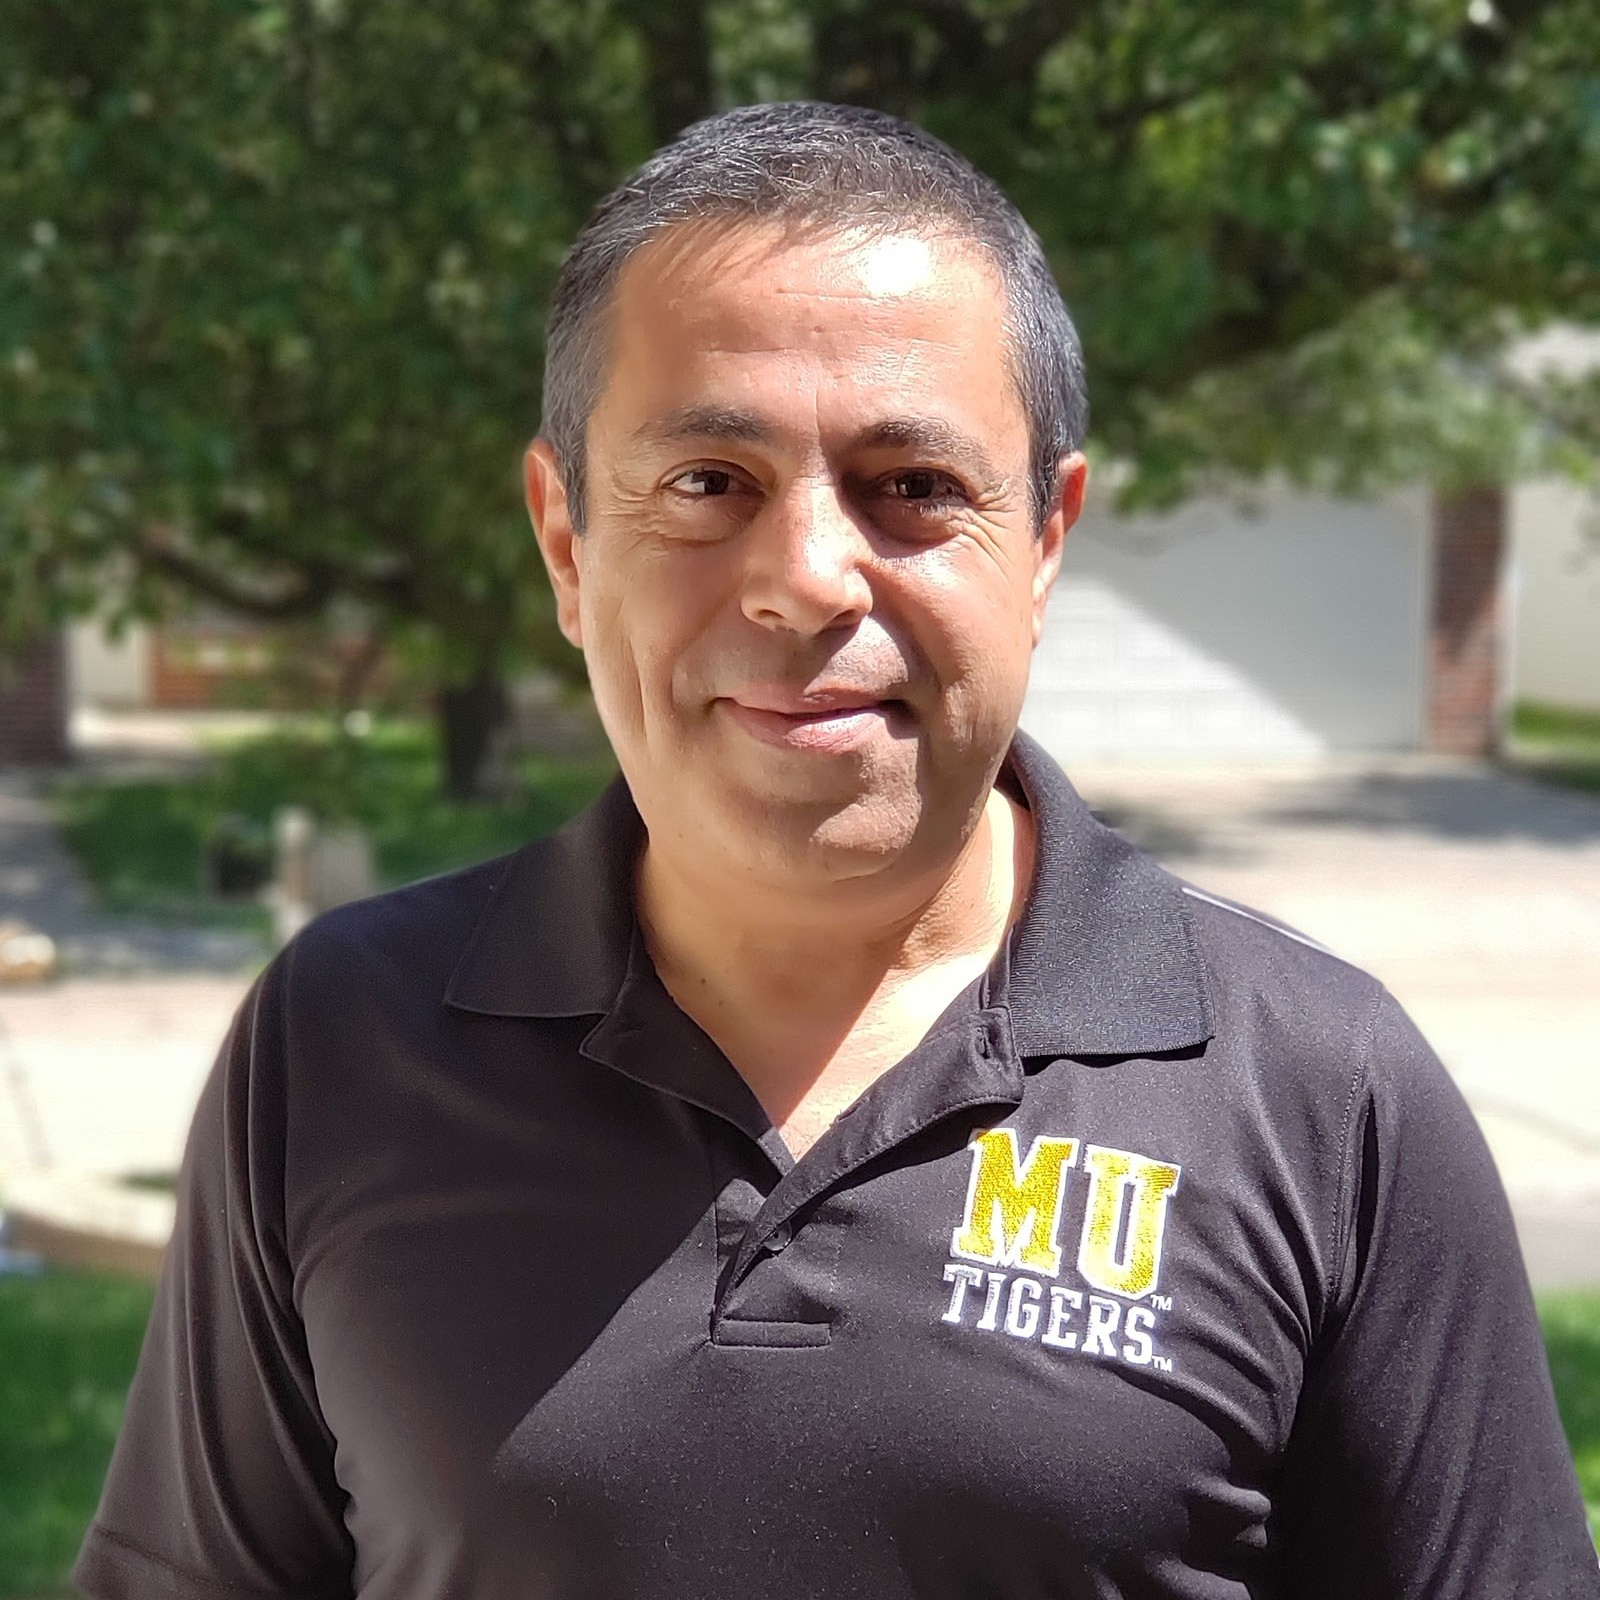 Educational collaboration between Izmir University of Economics and the University of Missouri